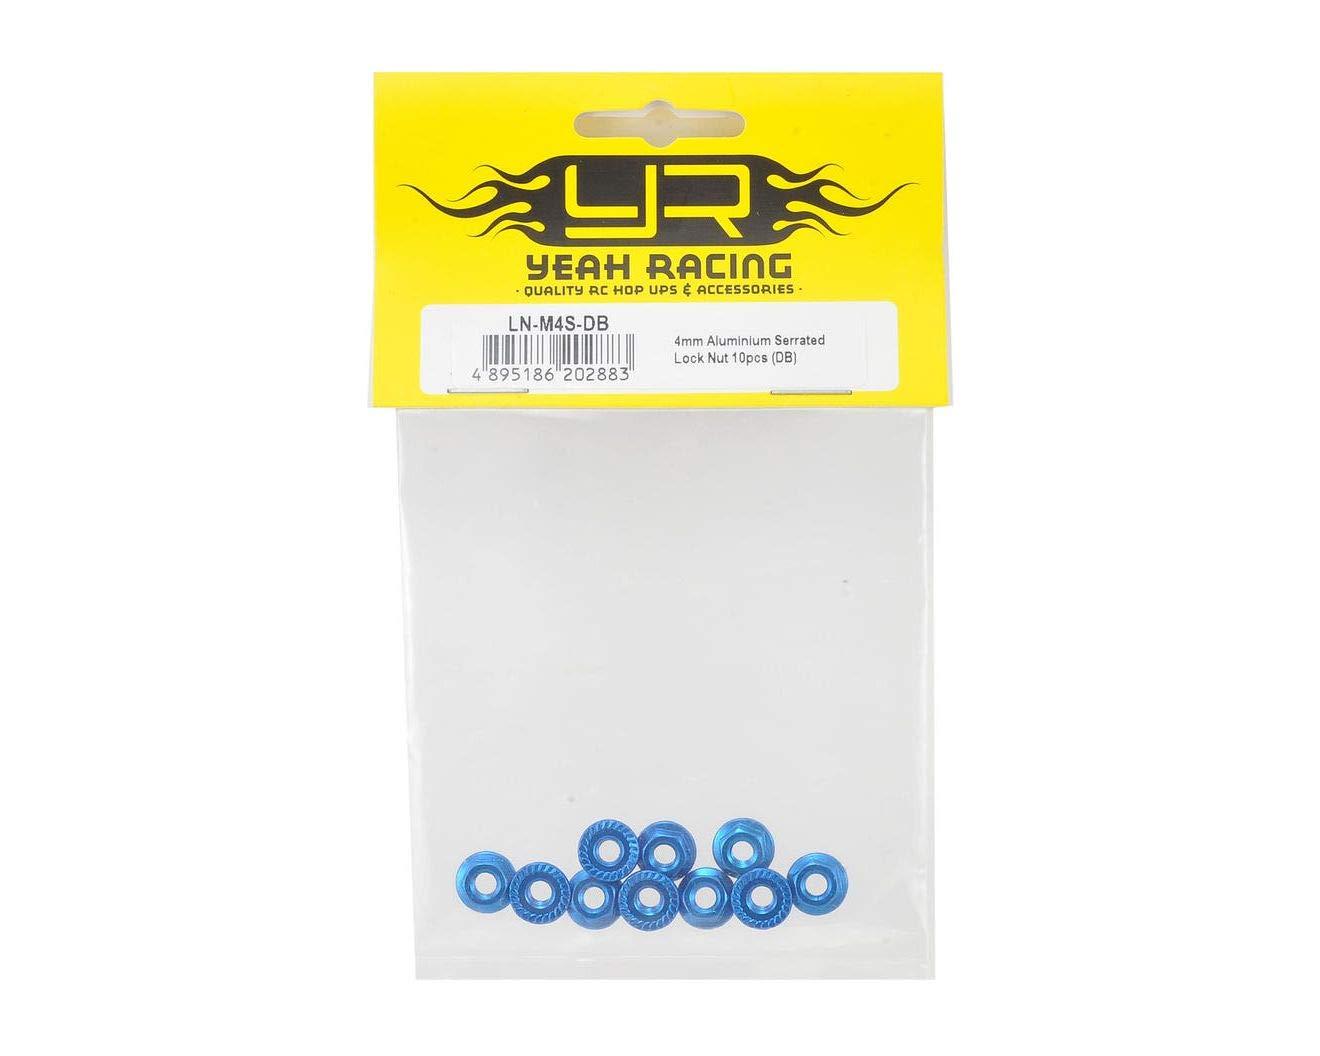 Blue YEALNM4SDB 10 YEA-LN-M4S-DB for 4mm Aluminum Serrated Lock Nut